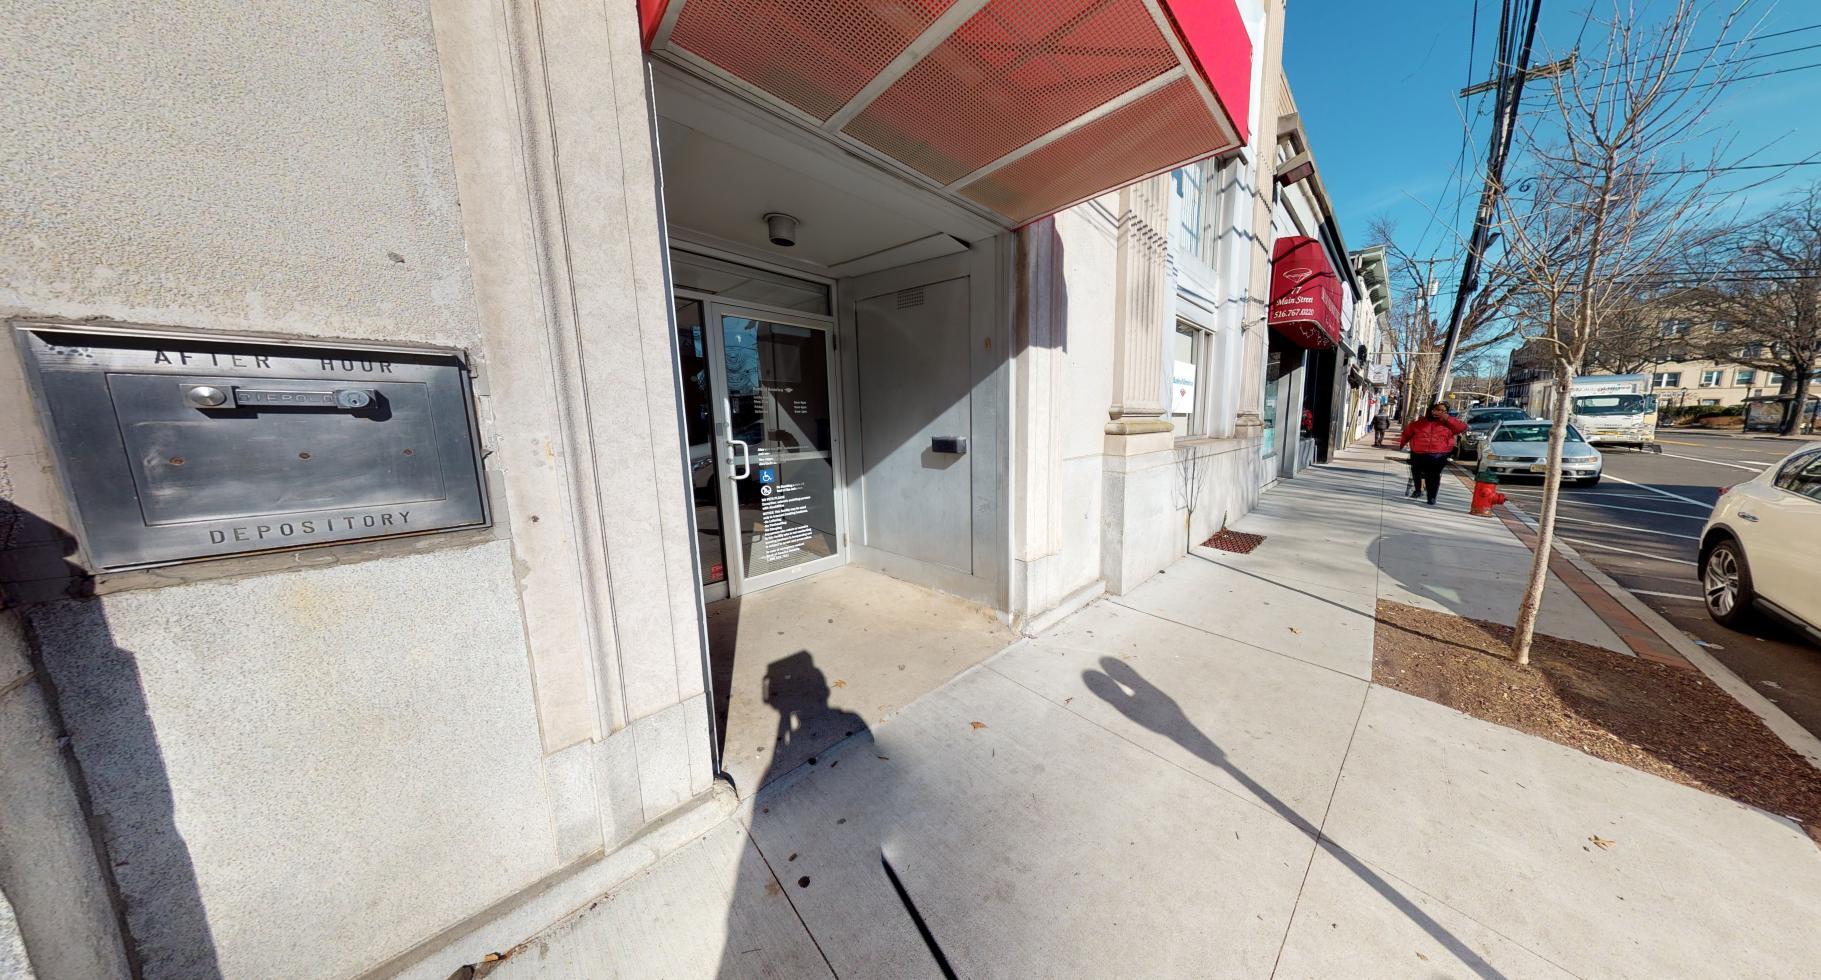 Bank of America financial center with walk-up ATM | 79 Main St, Port Washington, NY 11050